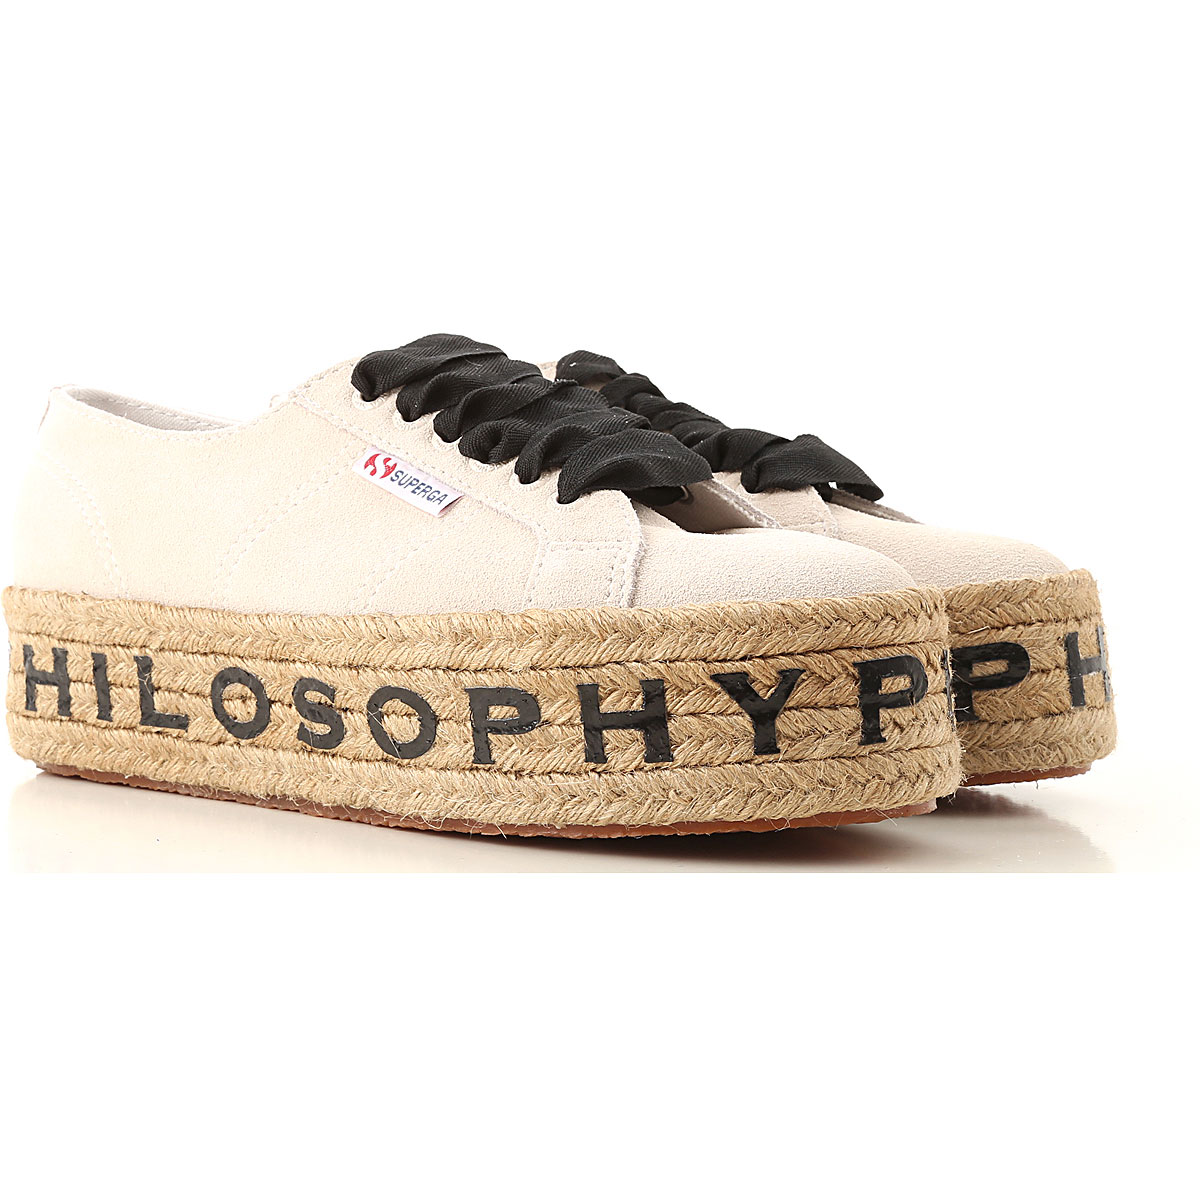 Philosophy di Lorenzo Serafini Sneaker Femme, Crème, Daim, 2017, 36 37 38 39 40 41